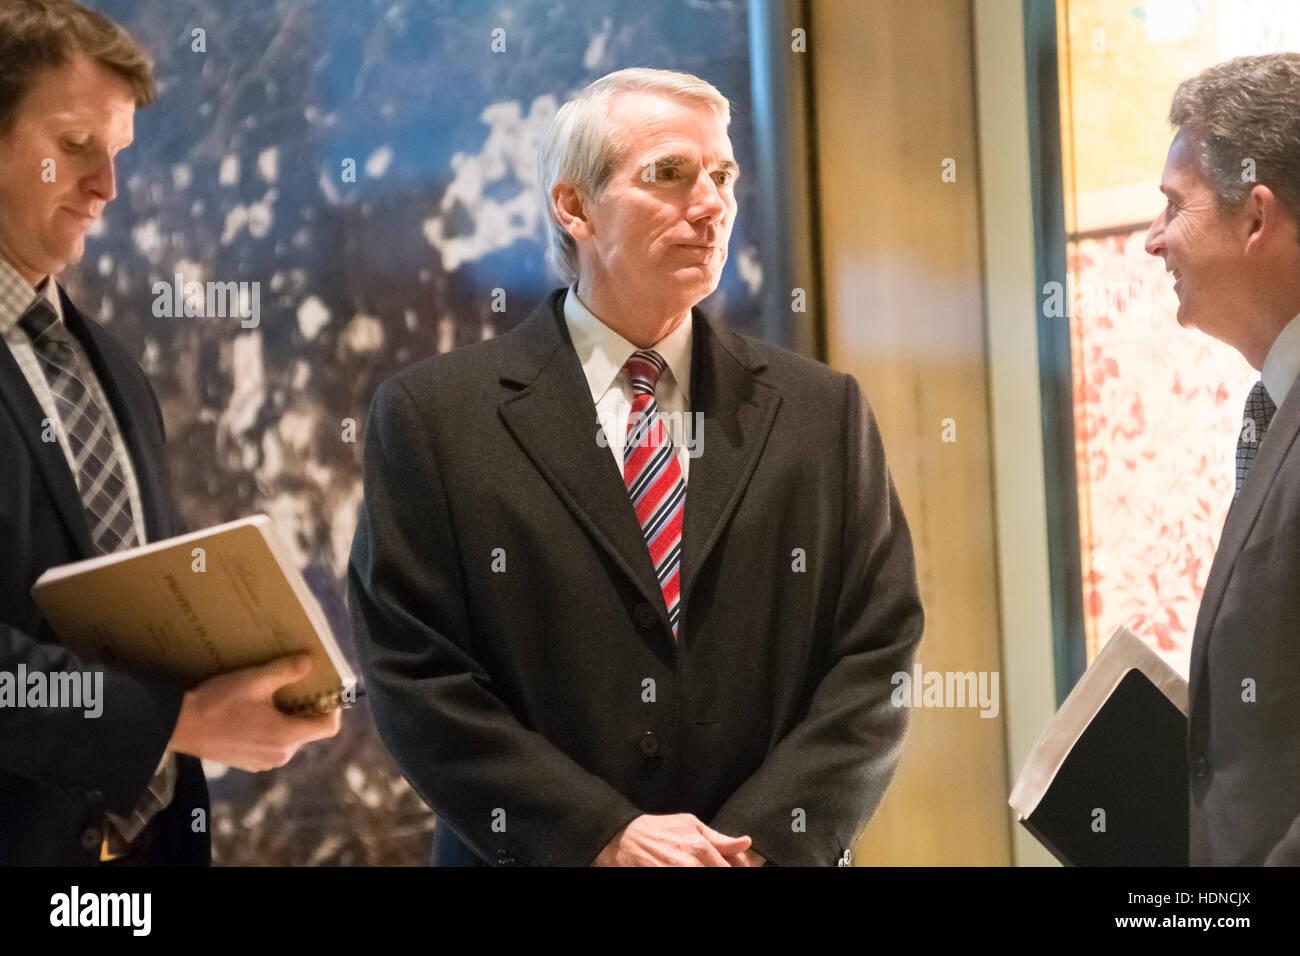 New York, USA. 14. Dezember 2016. US-Senator Robert Portman (Republikanische of Ohio) wird bei seiner Ankunft im Stockfoto